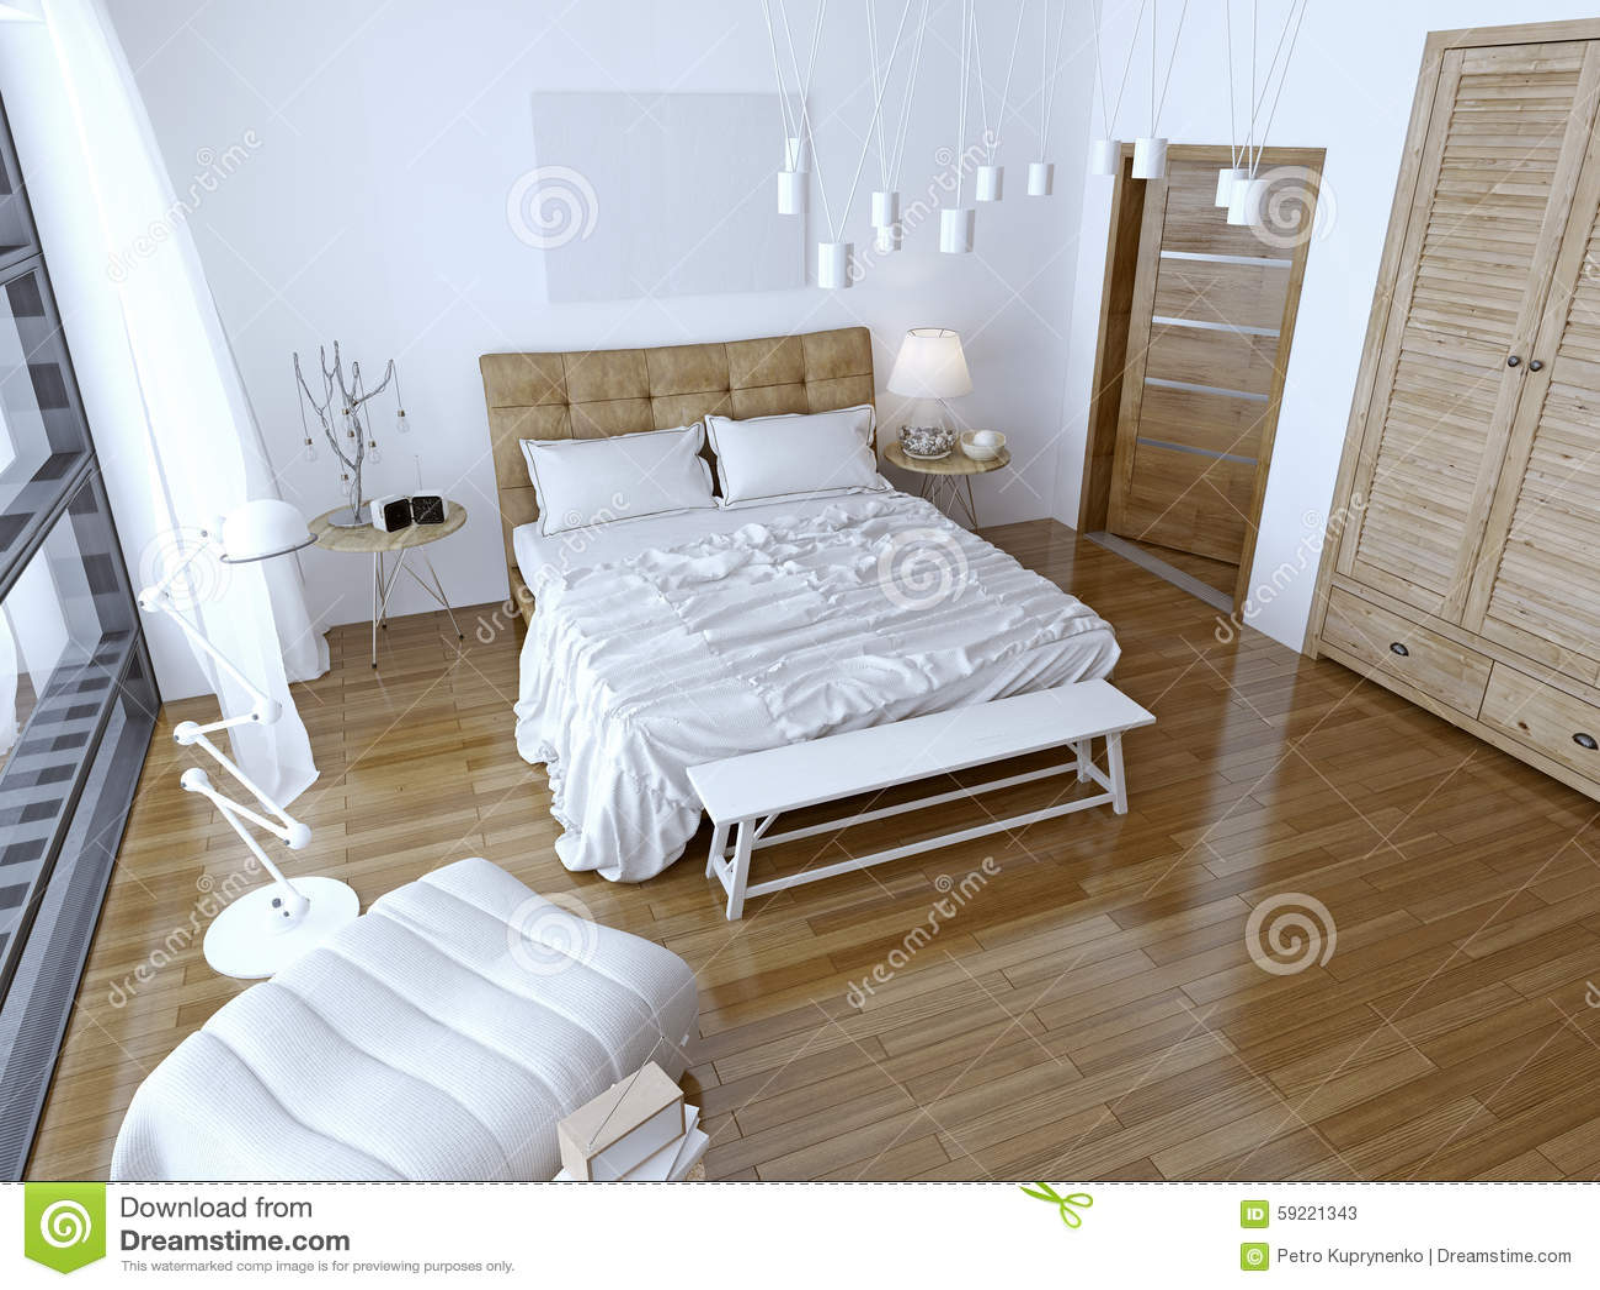 Bruine Slaapkamer Muur : Moderne slaapkamer met bruin bed en witte muur stock afbeelding